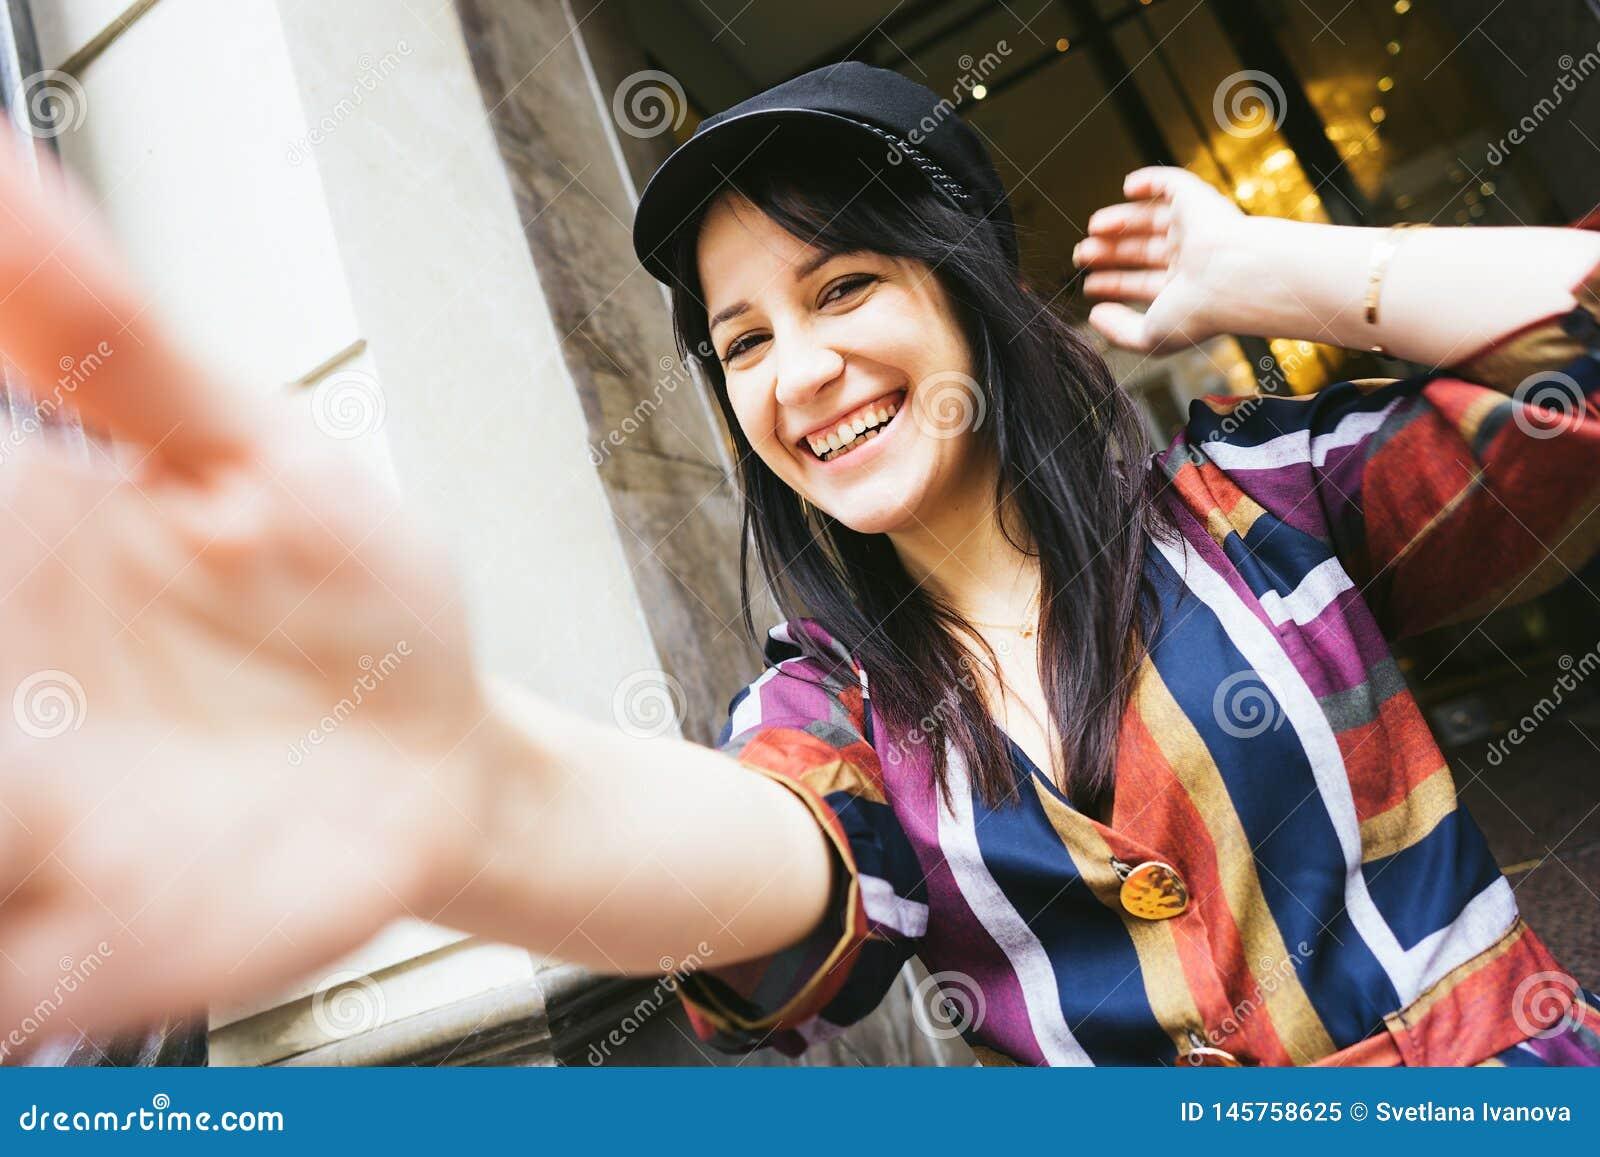 Gelukkige lachende gemengde rasvrouw in een multi-colored gestreepte kleding